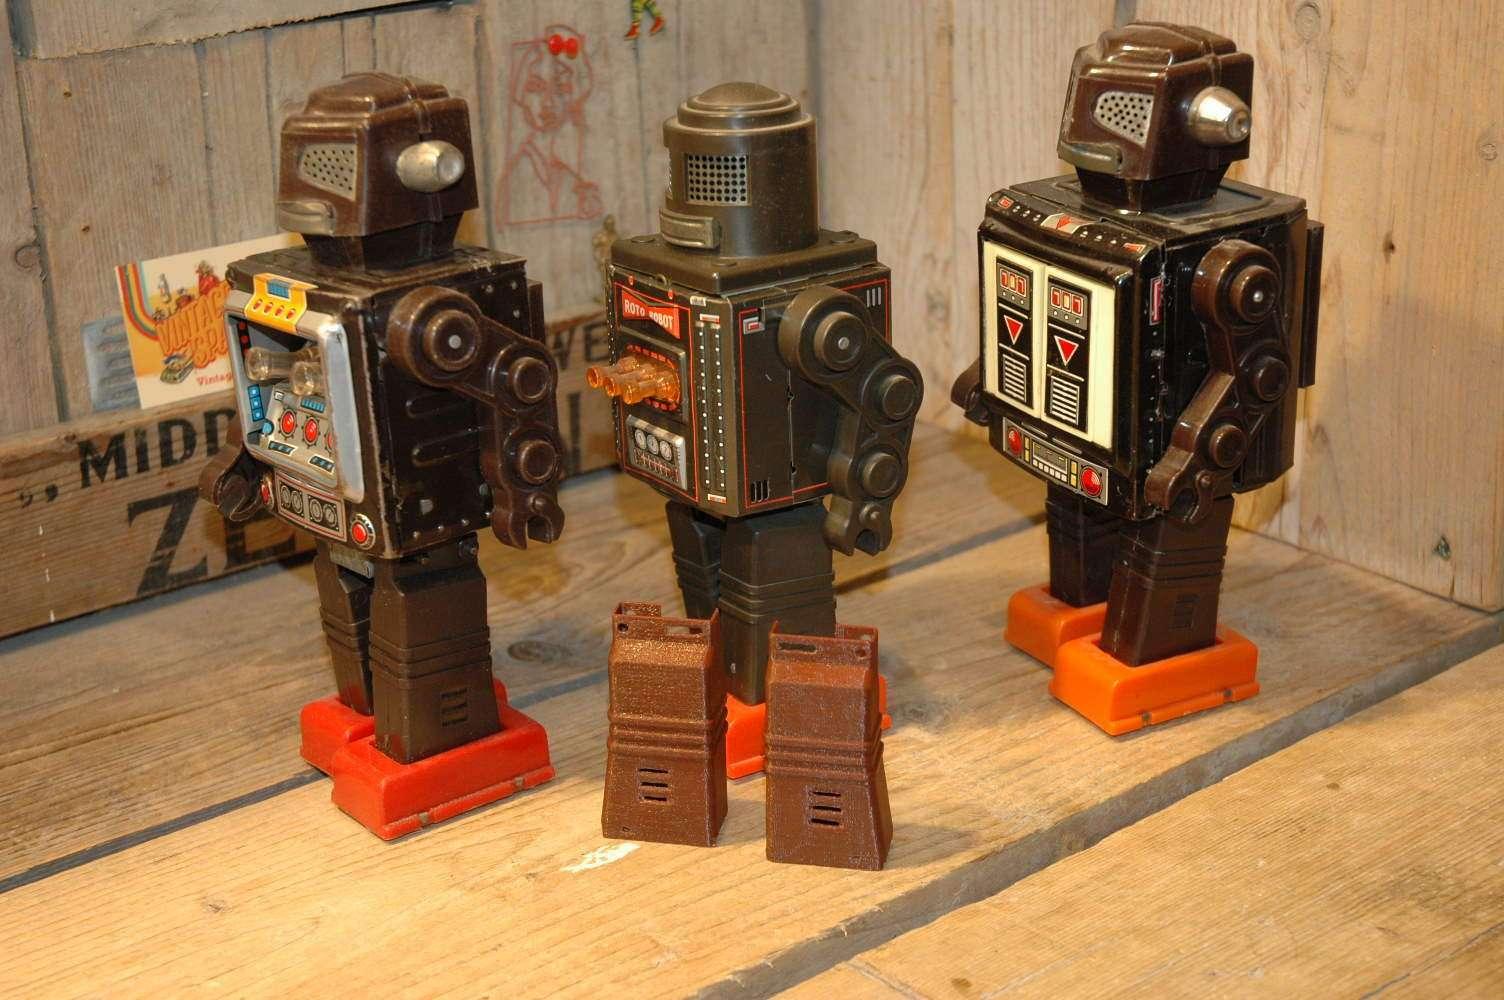 Horikawa - Robot Legs